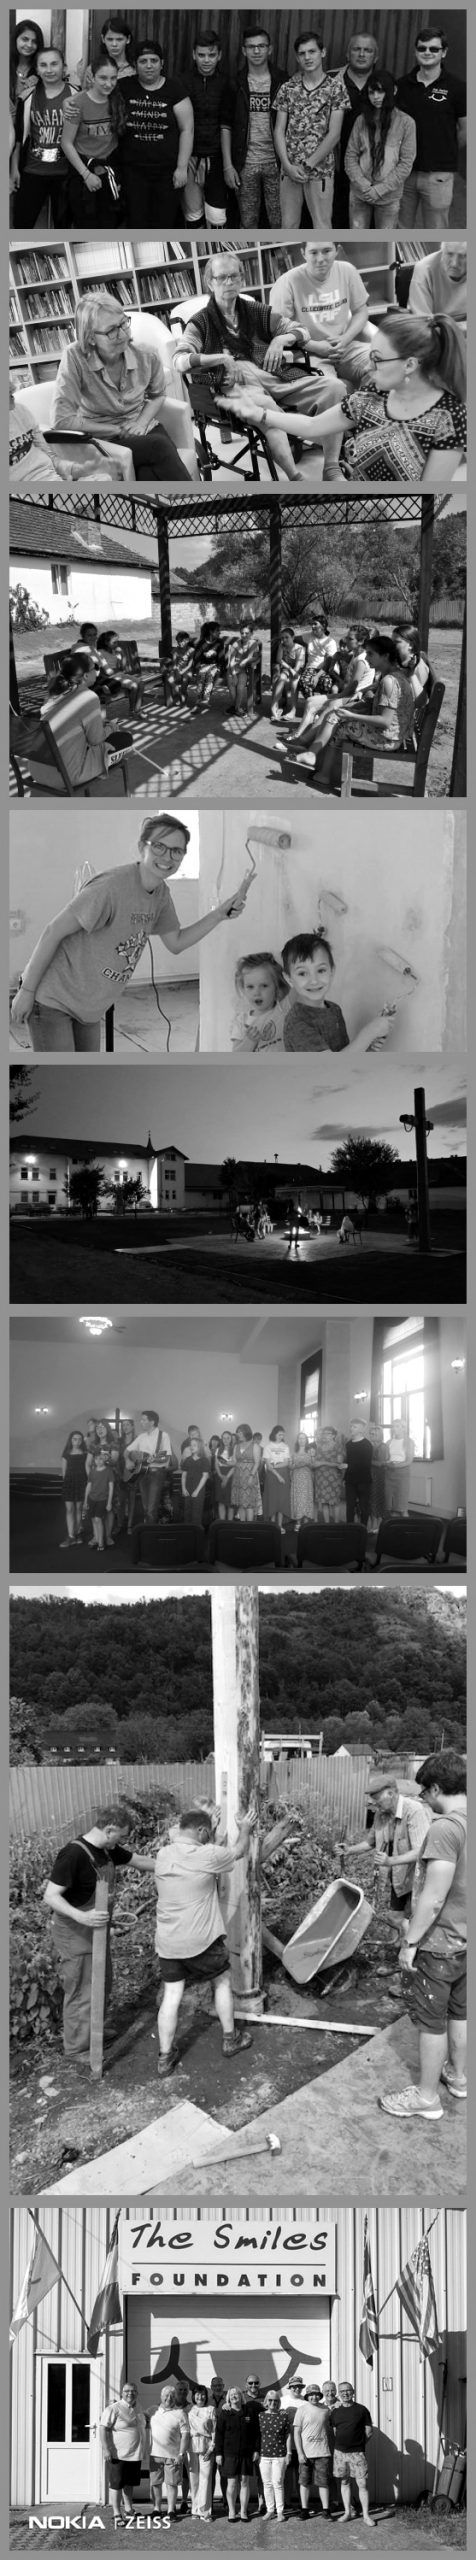 Previous mission trip photos